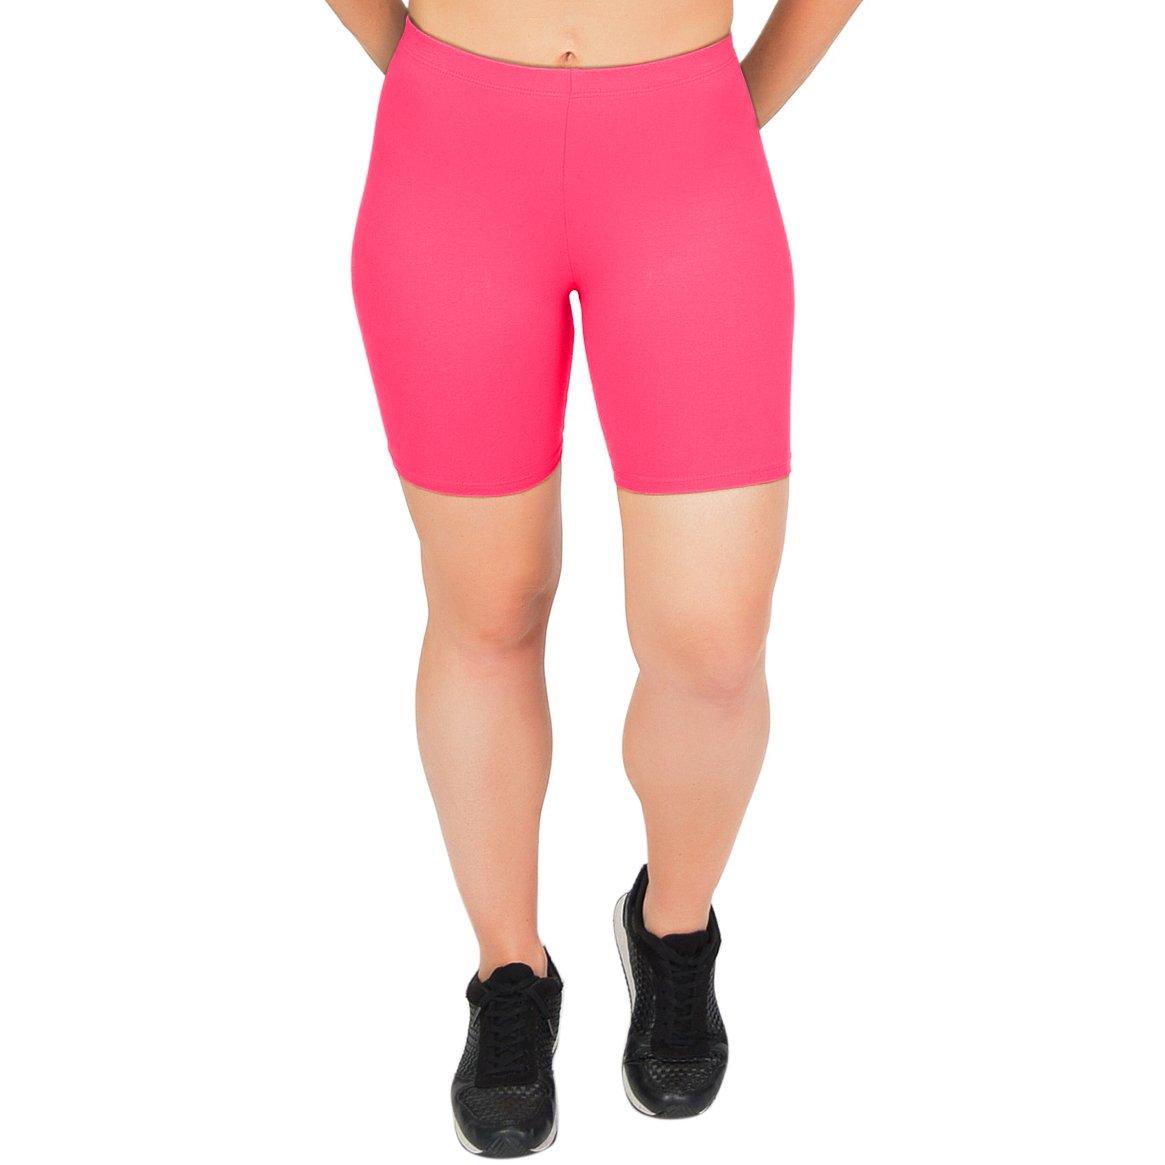 Stretch is Comfort Women's Cotton Bike Shorts Hot Pink 2X